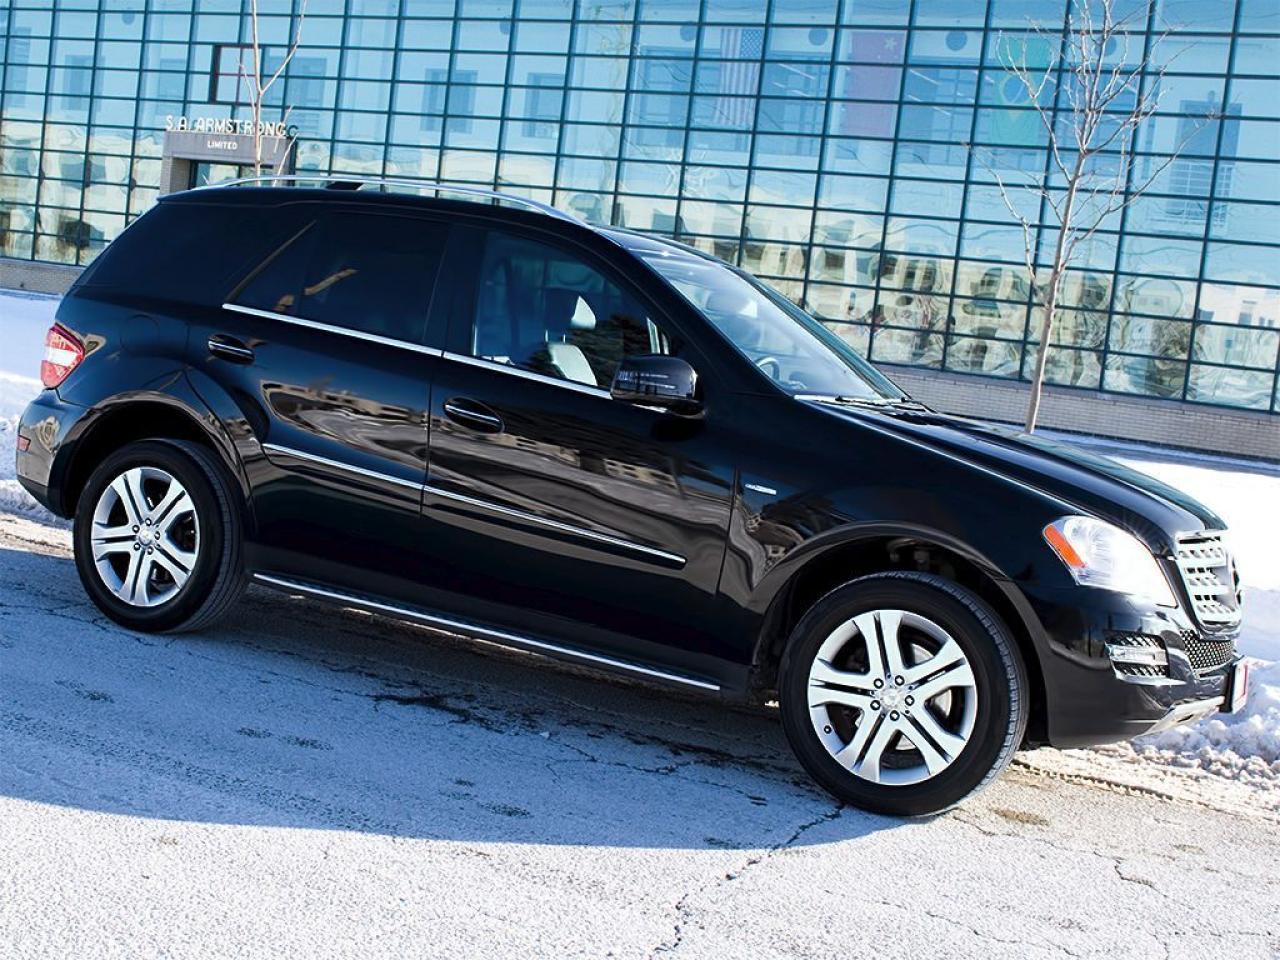 Photo of Black 2011 Mercedes-Benz ML 350